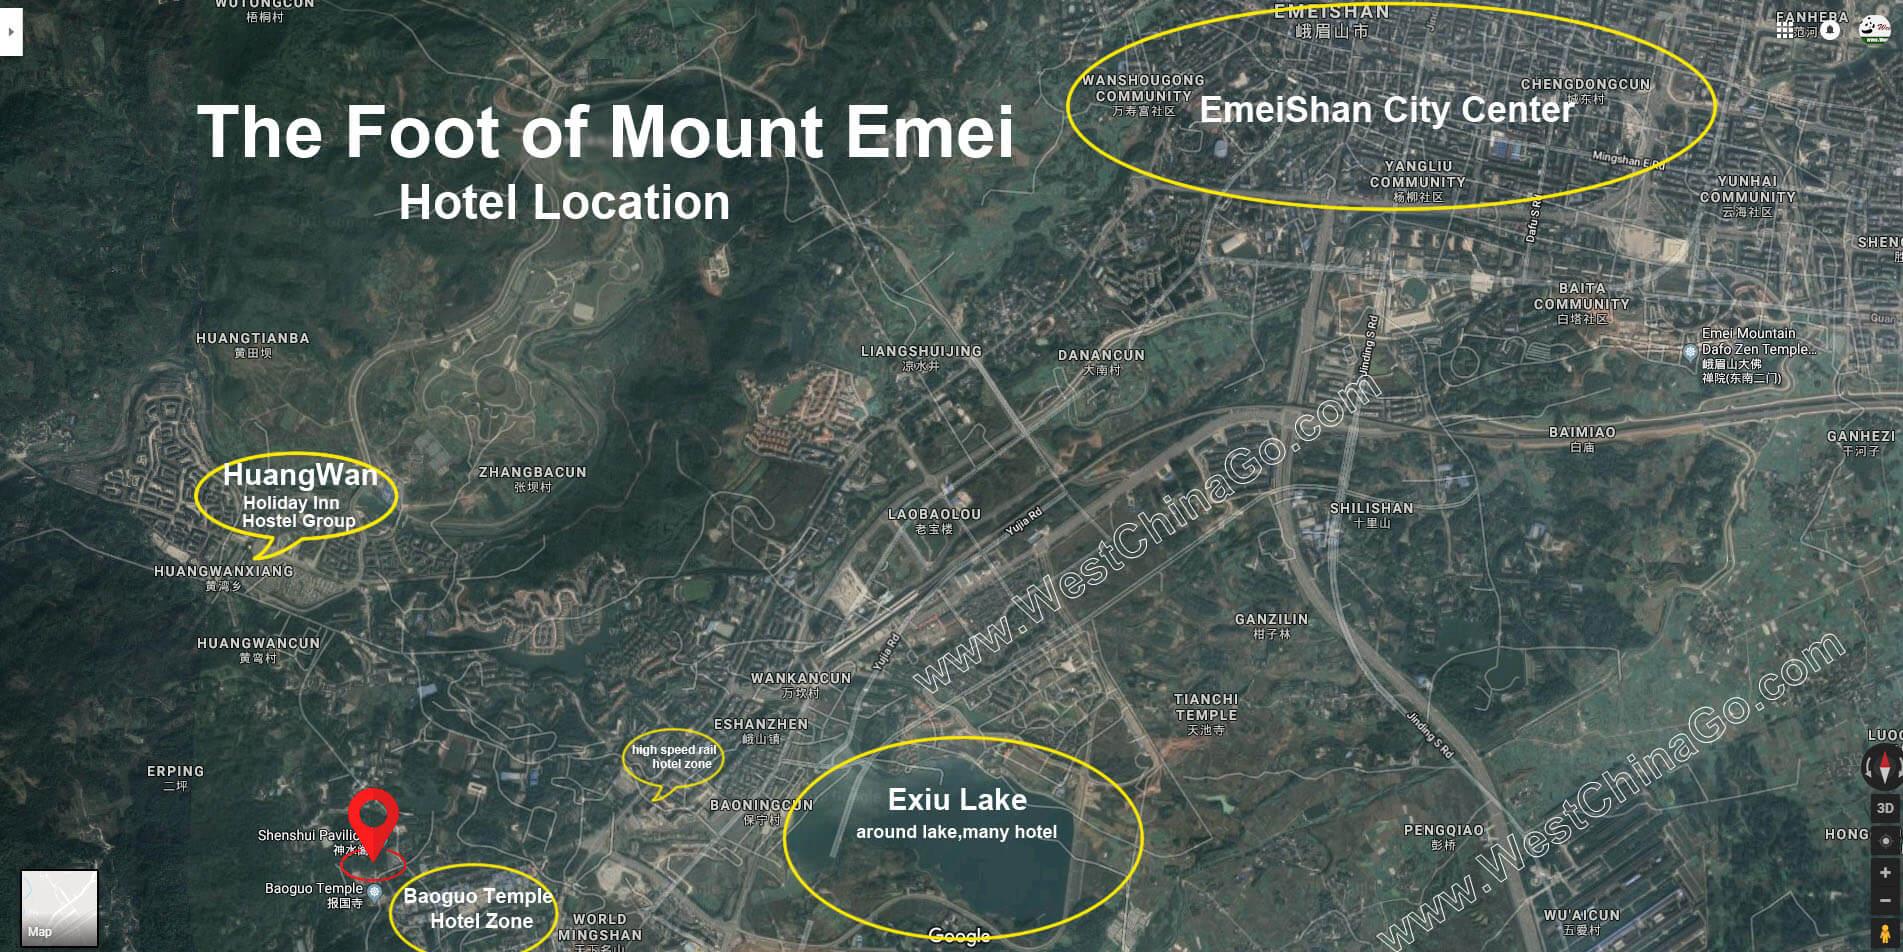 Mountain Emei hotel map